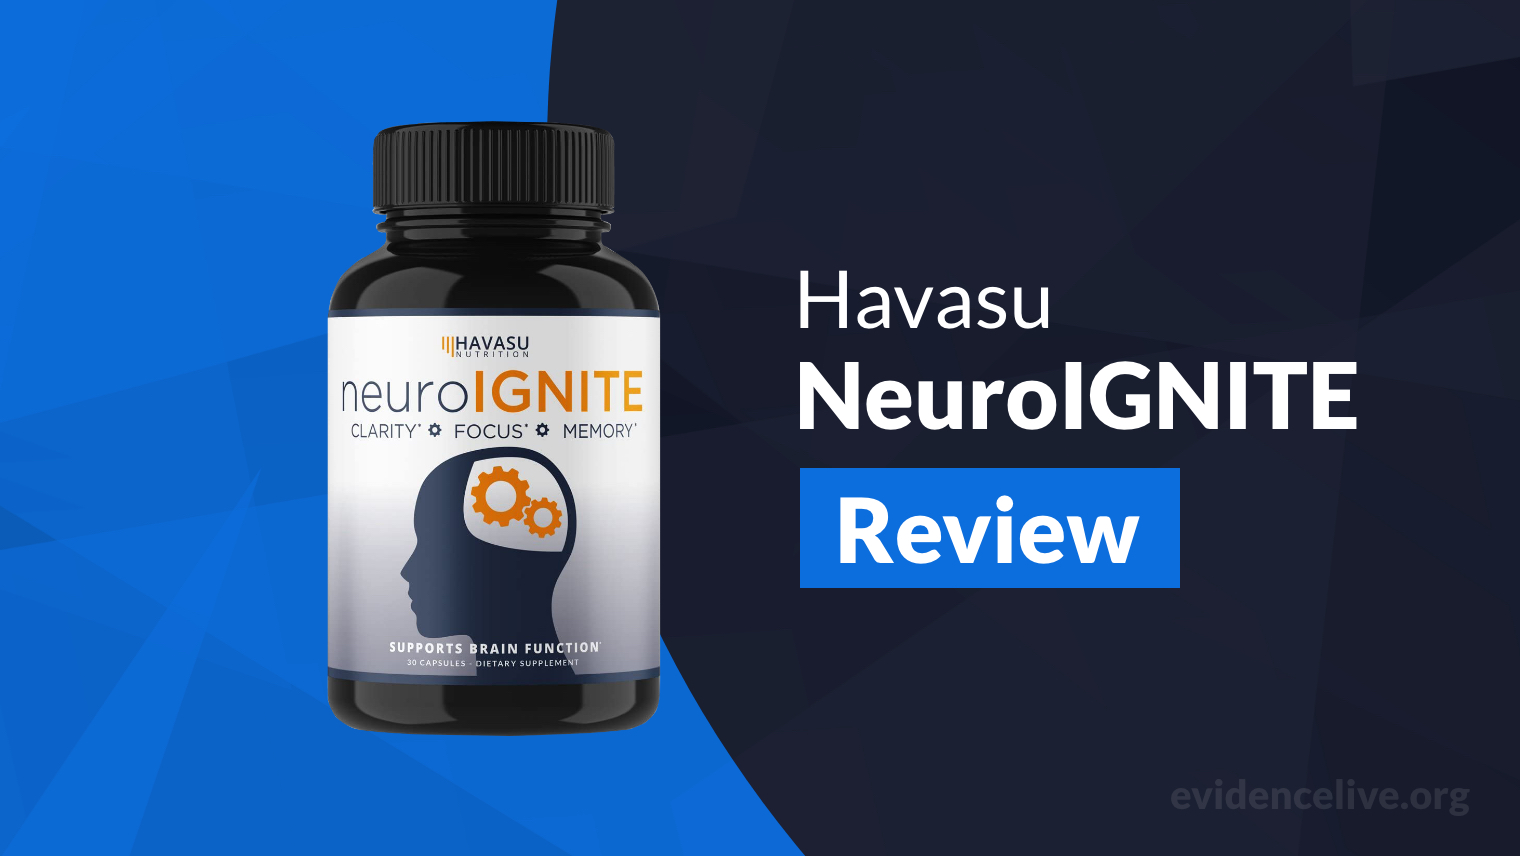 Havasu Nutrition NeuroIGNITE Review: Is It Worth It?